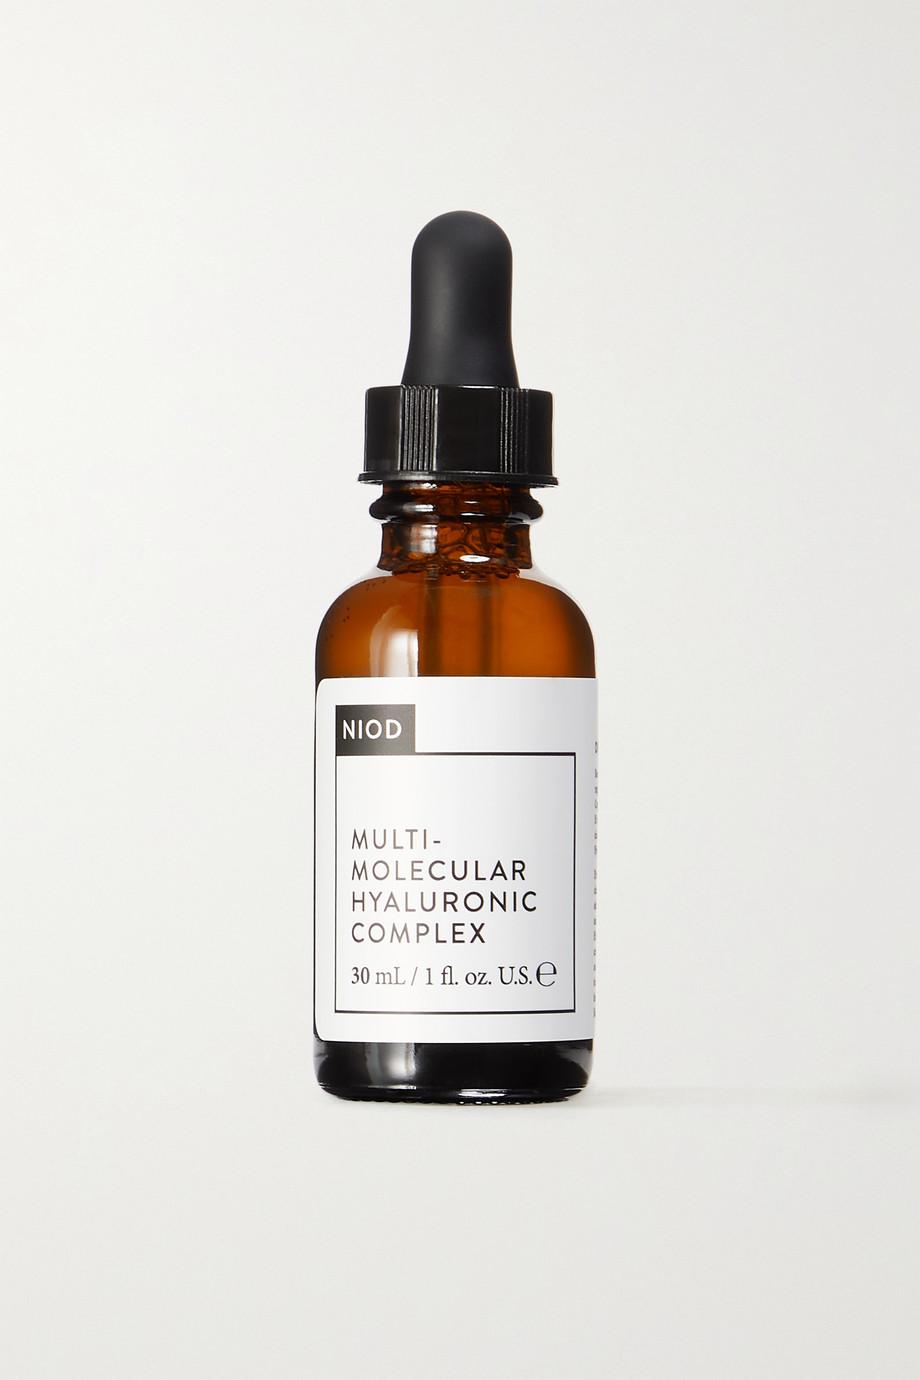 NIOD Sérum Multi-Molecular Hyaluronic Complex, 30 ml